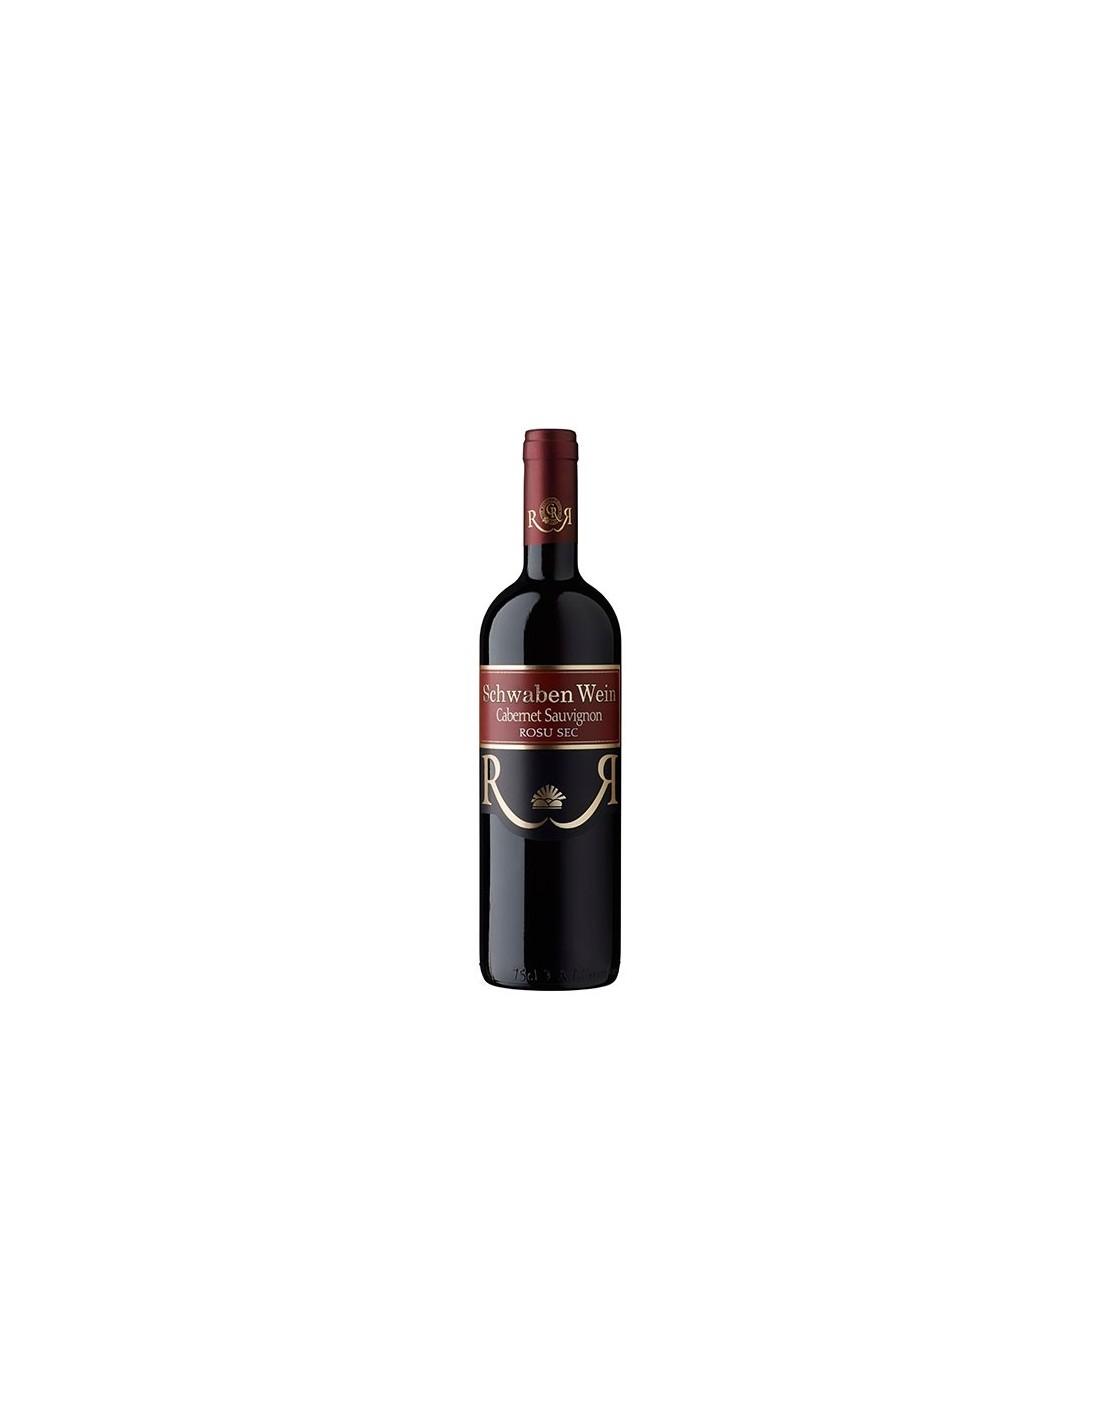 Vin rosu sec, Cabernet Sauvignon, Schwaben Wein Recas, 0.75L, Romania